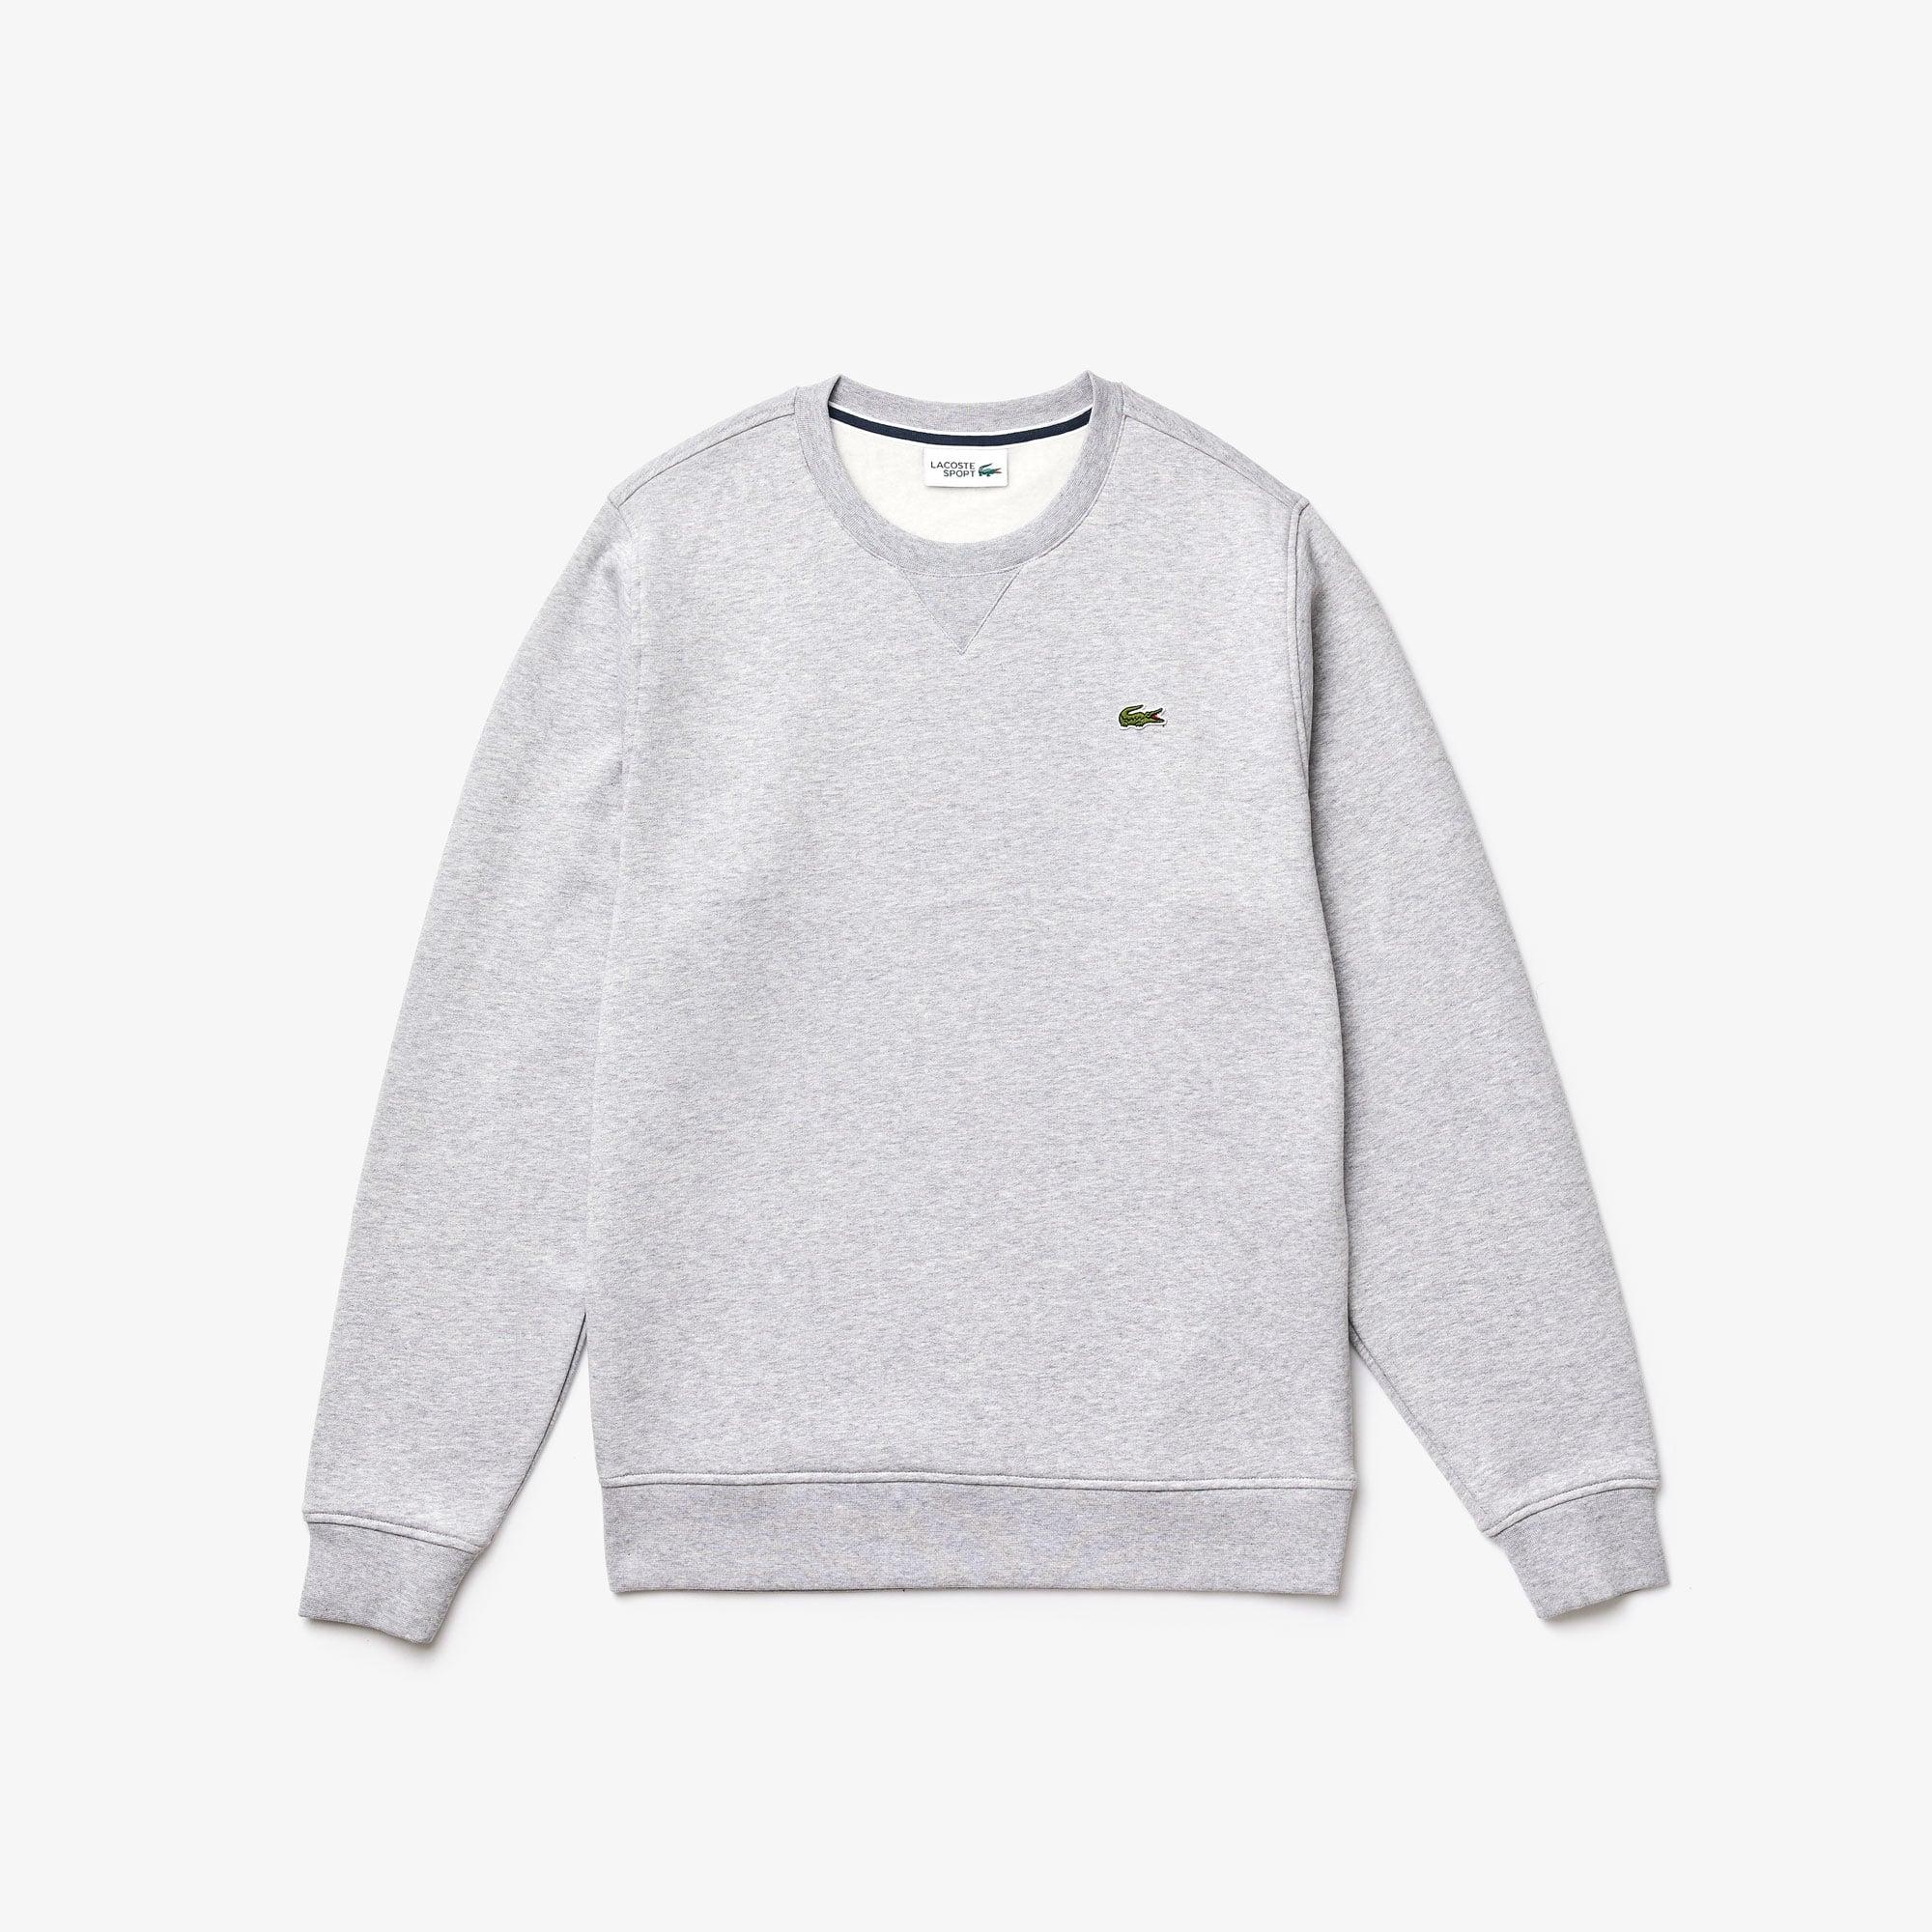 Vêtements Sweatshirts Vêtements Vêtements Lacoste Sweatshirts Lacoste Vêtements Homme Lacoste Homme Vêtements Homme Sweatshirts Lacoste Sweatshirts Homme Sweatshirts Homme UxSZCC